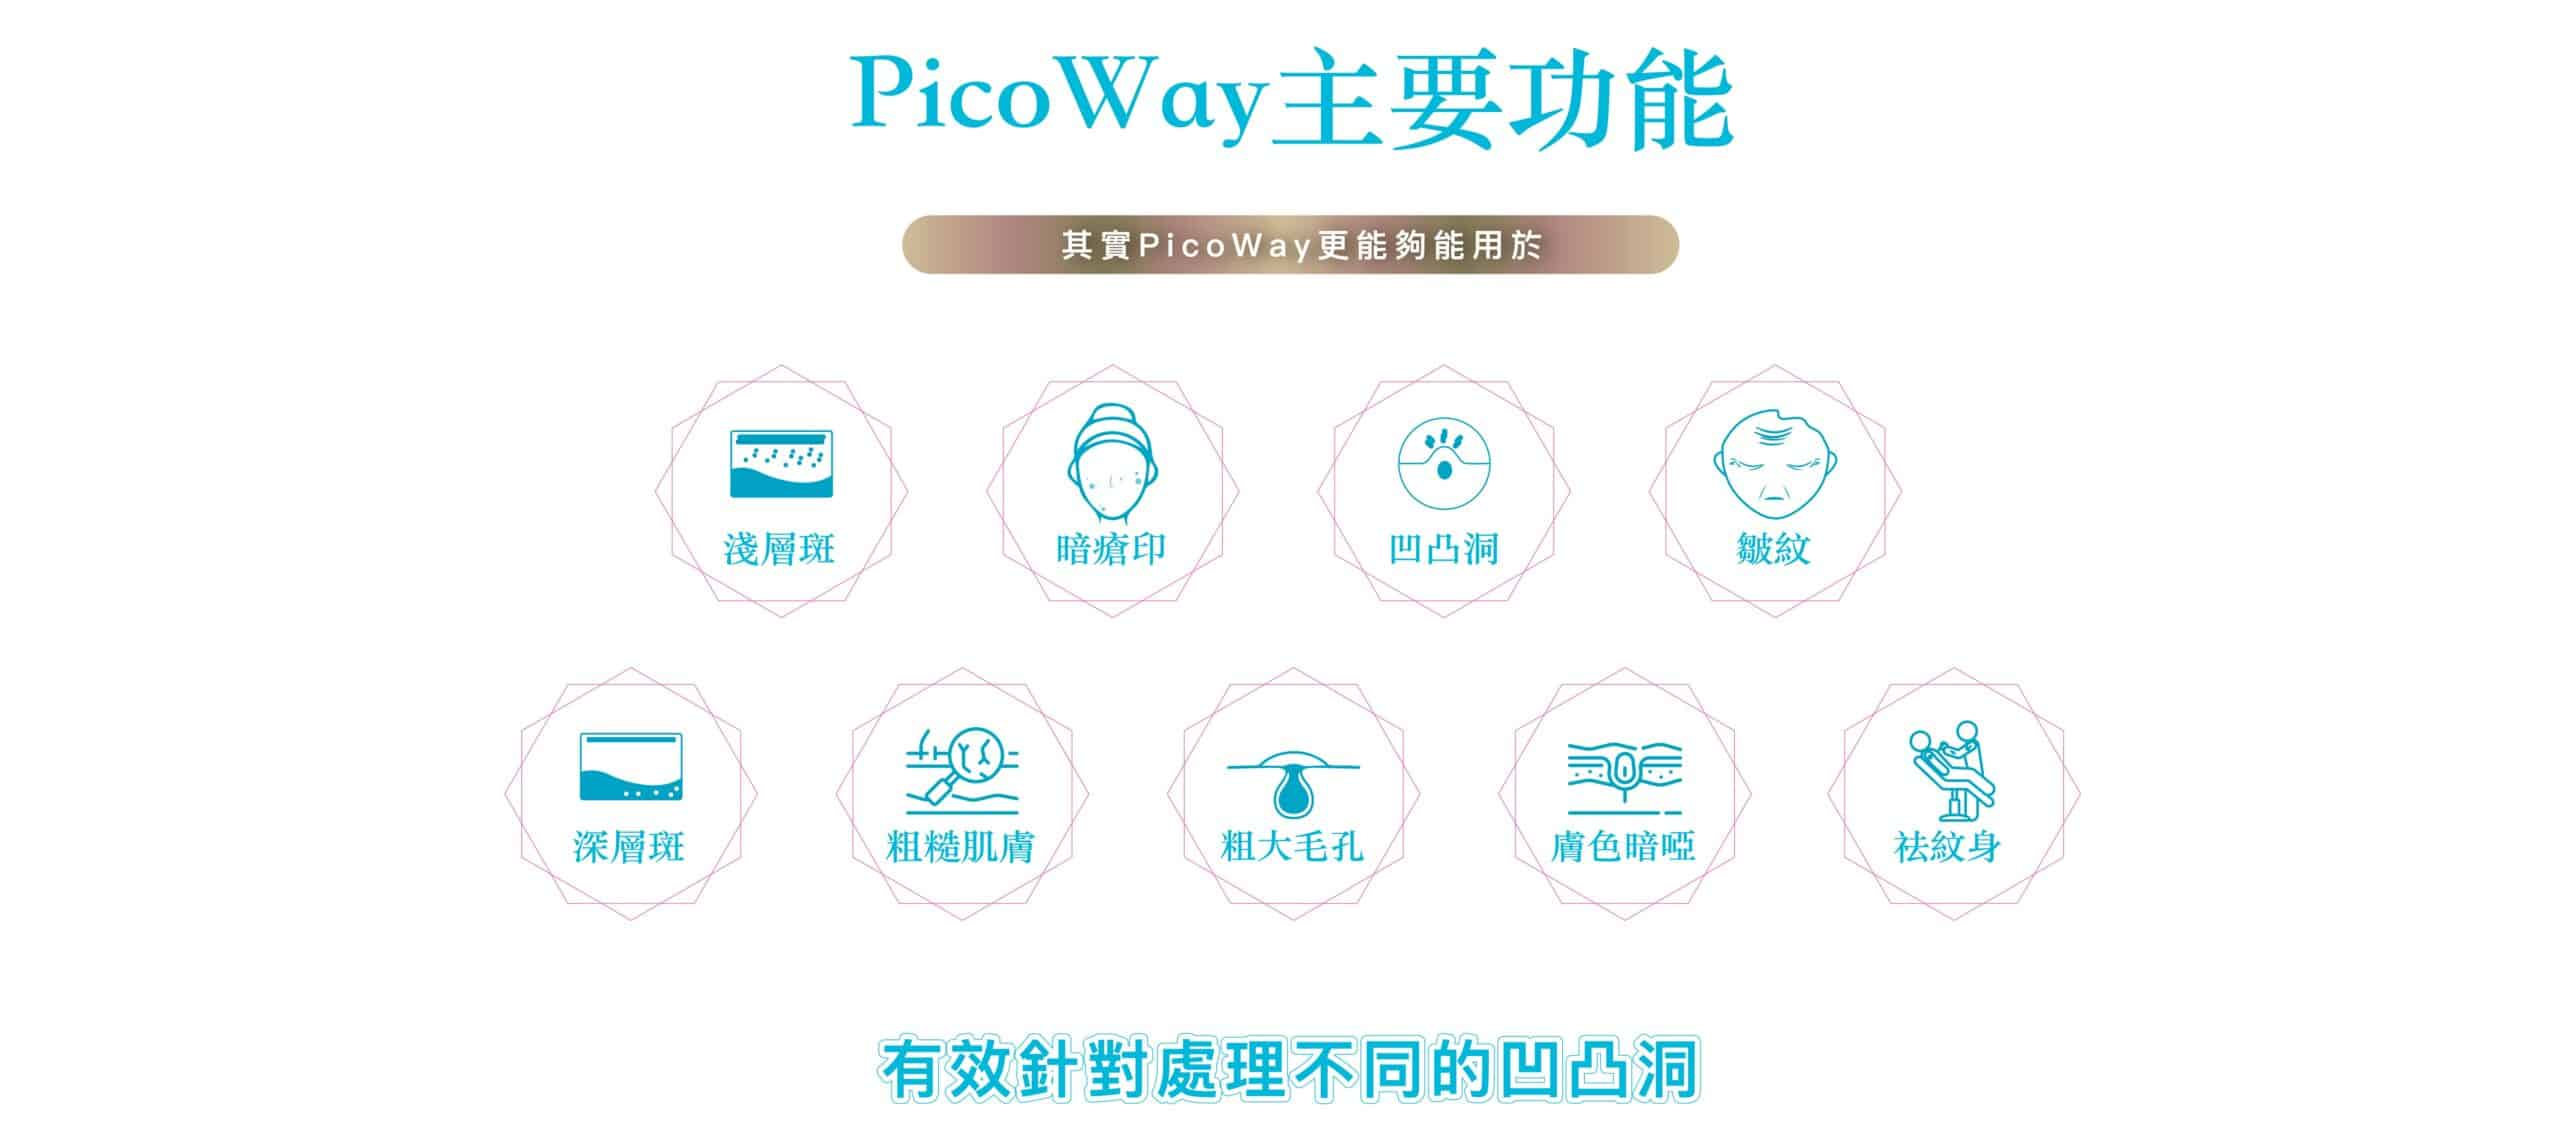 picoway_n03 pico bump hole 09 scaled